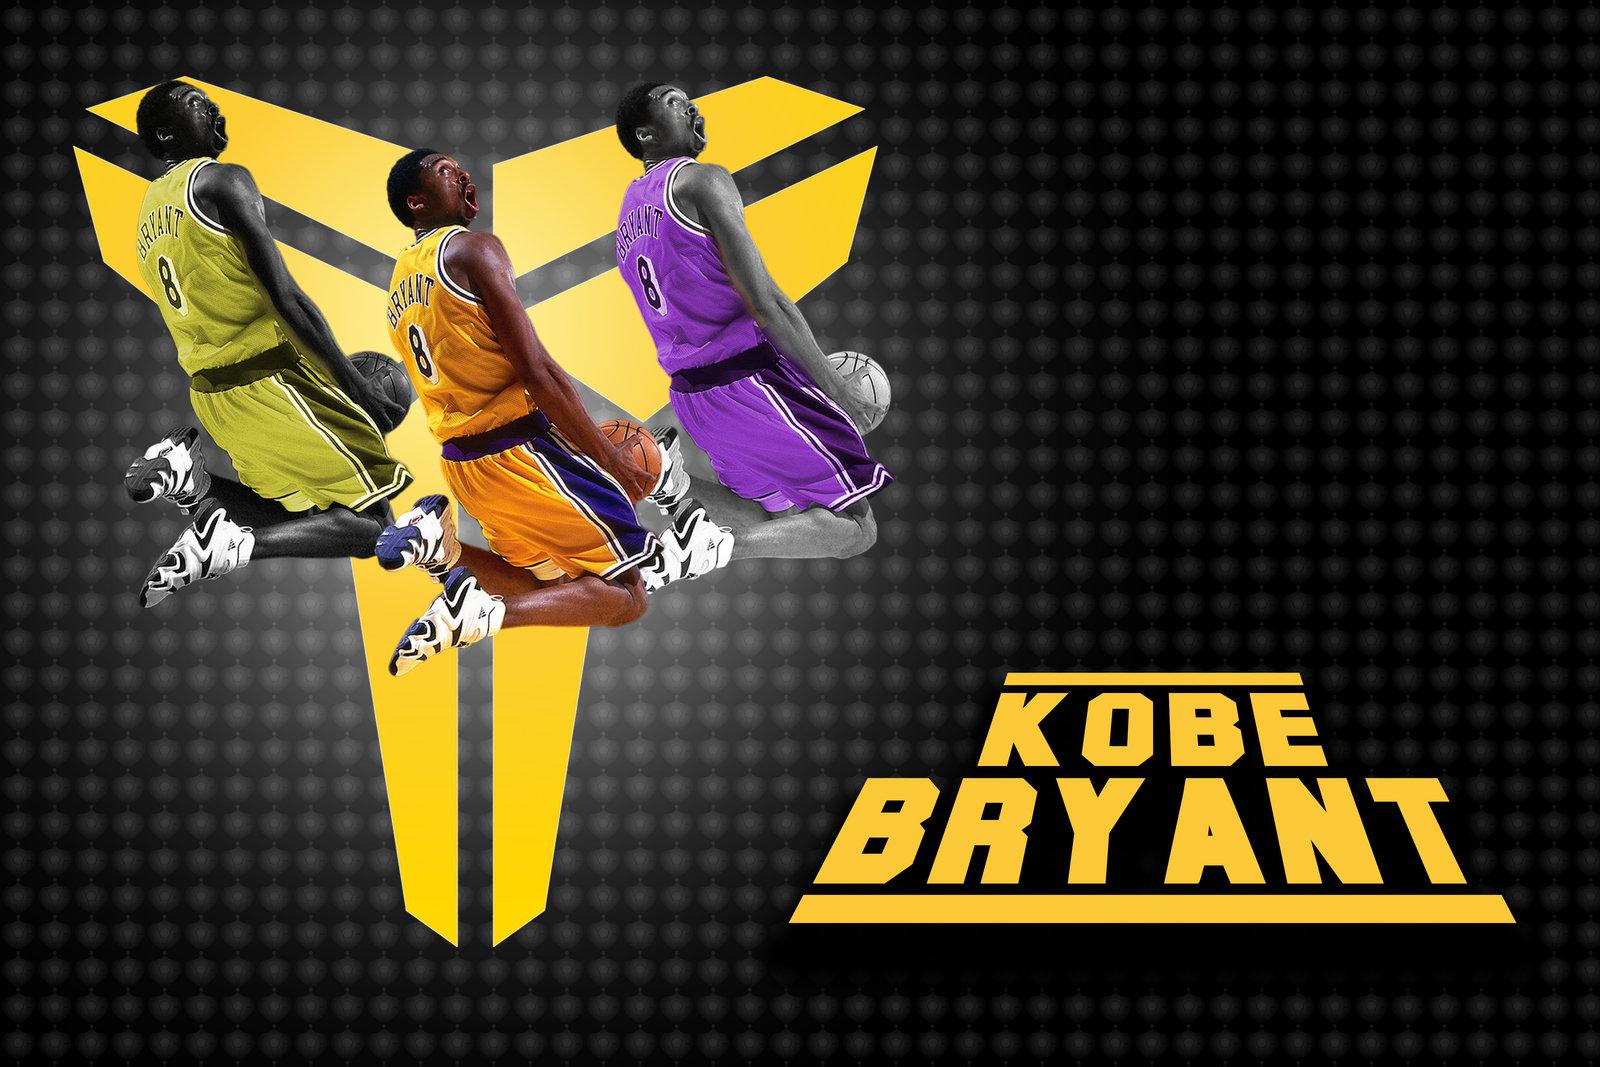 kobe bryant logo black 8 HD Wallpaper Basketball Wallpapers 1600x1067